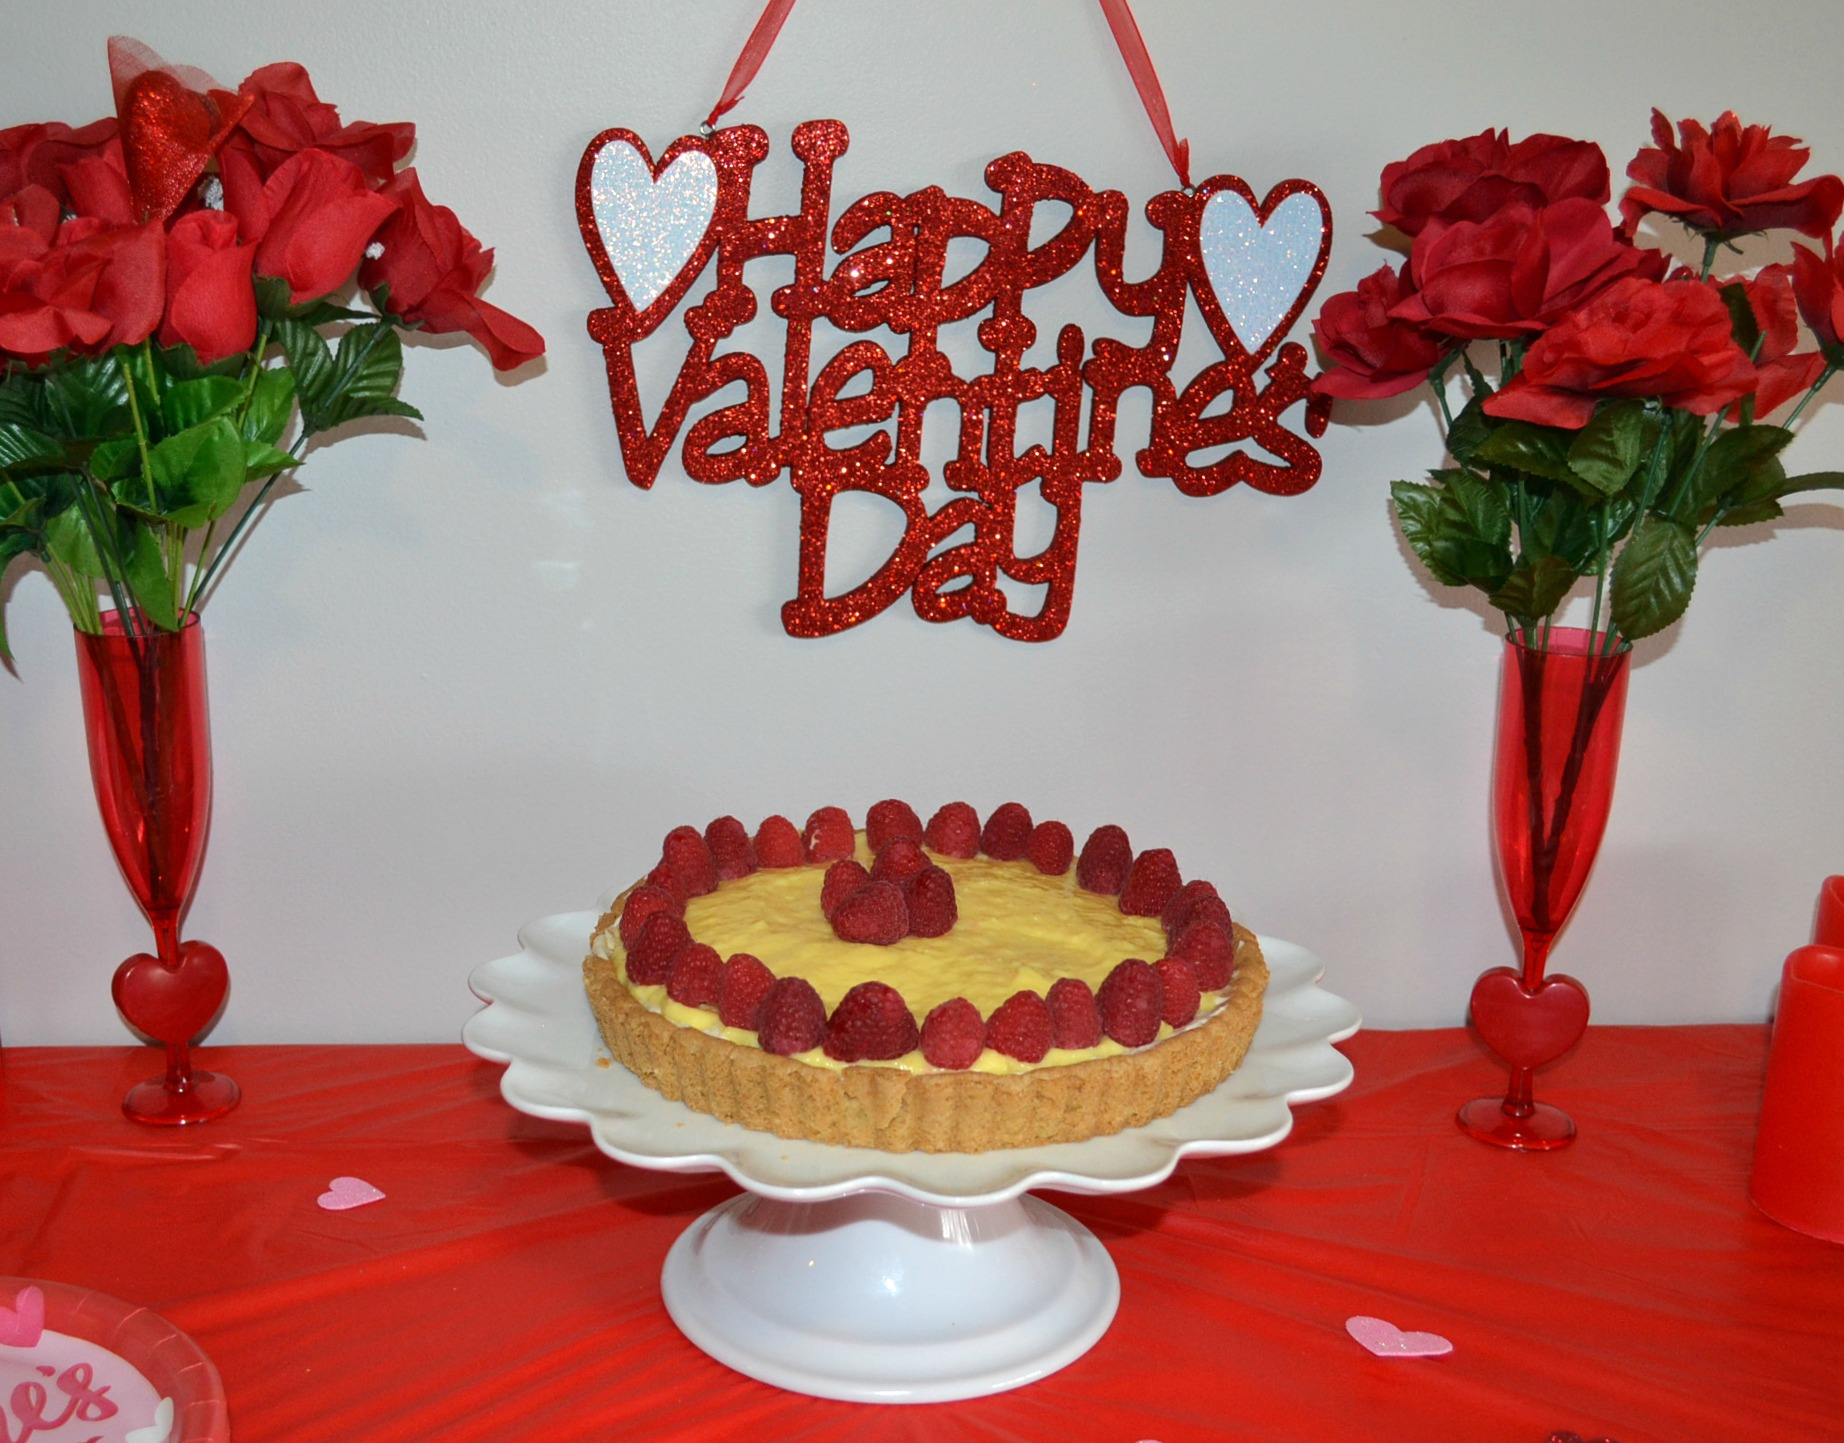 Raspberry Mascarpone Coconut Cream tart is an easy, elegant dessert to serve to your Valentine.